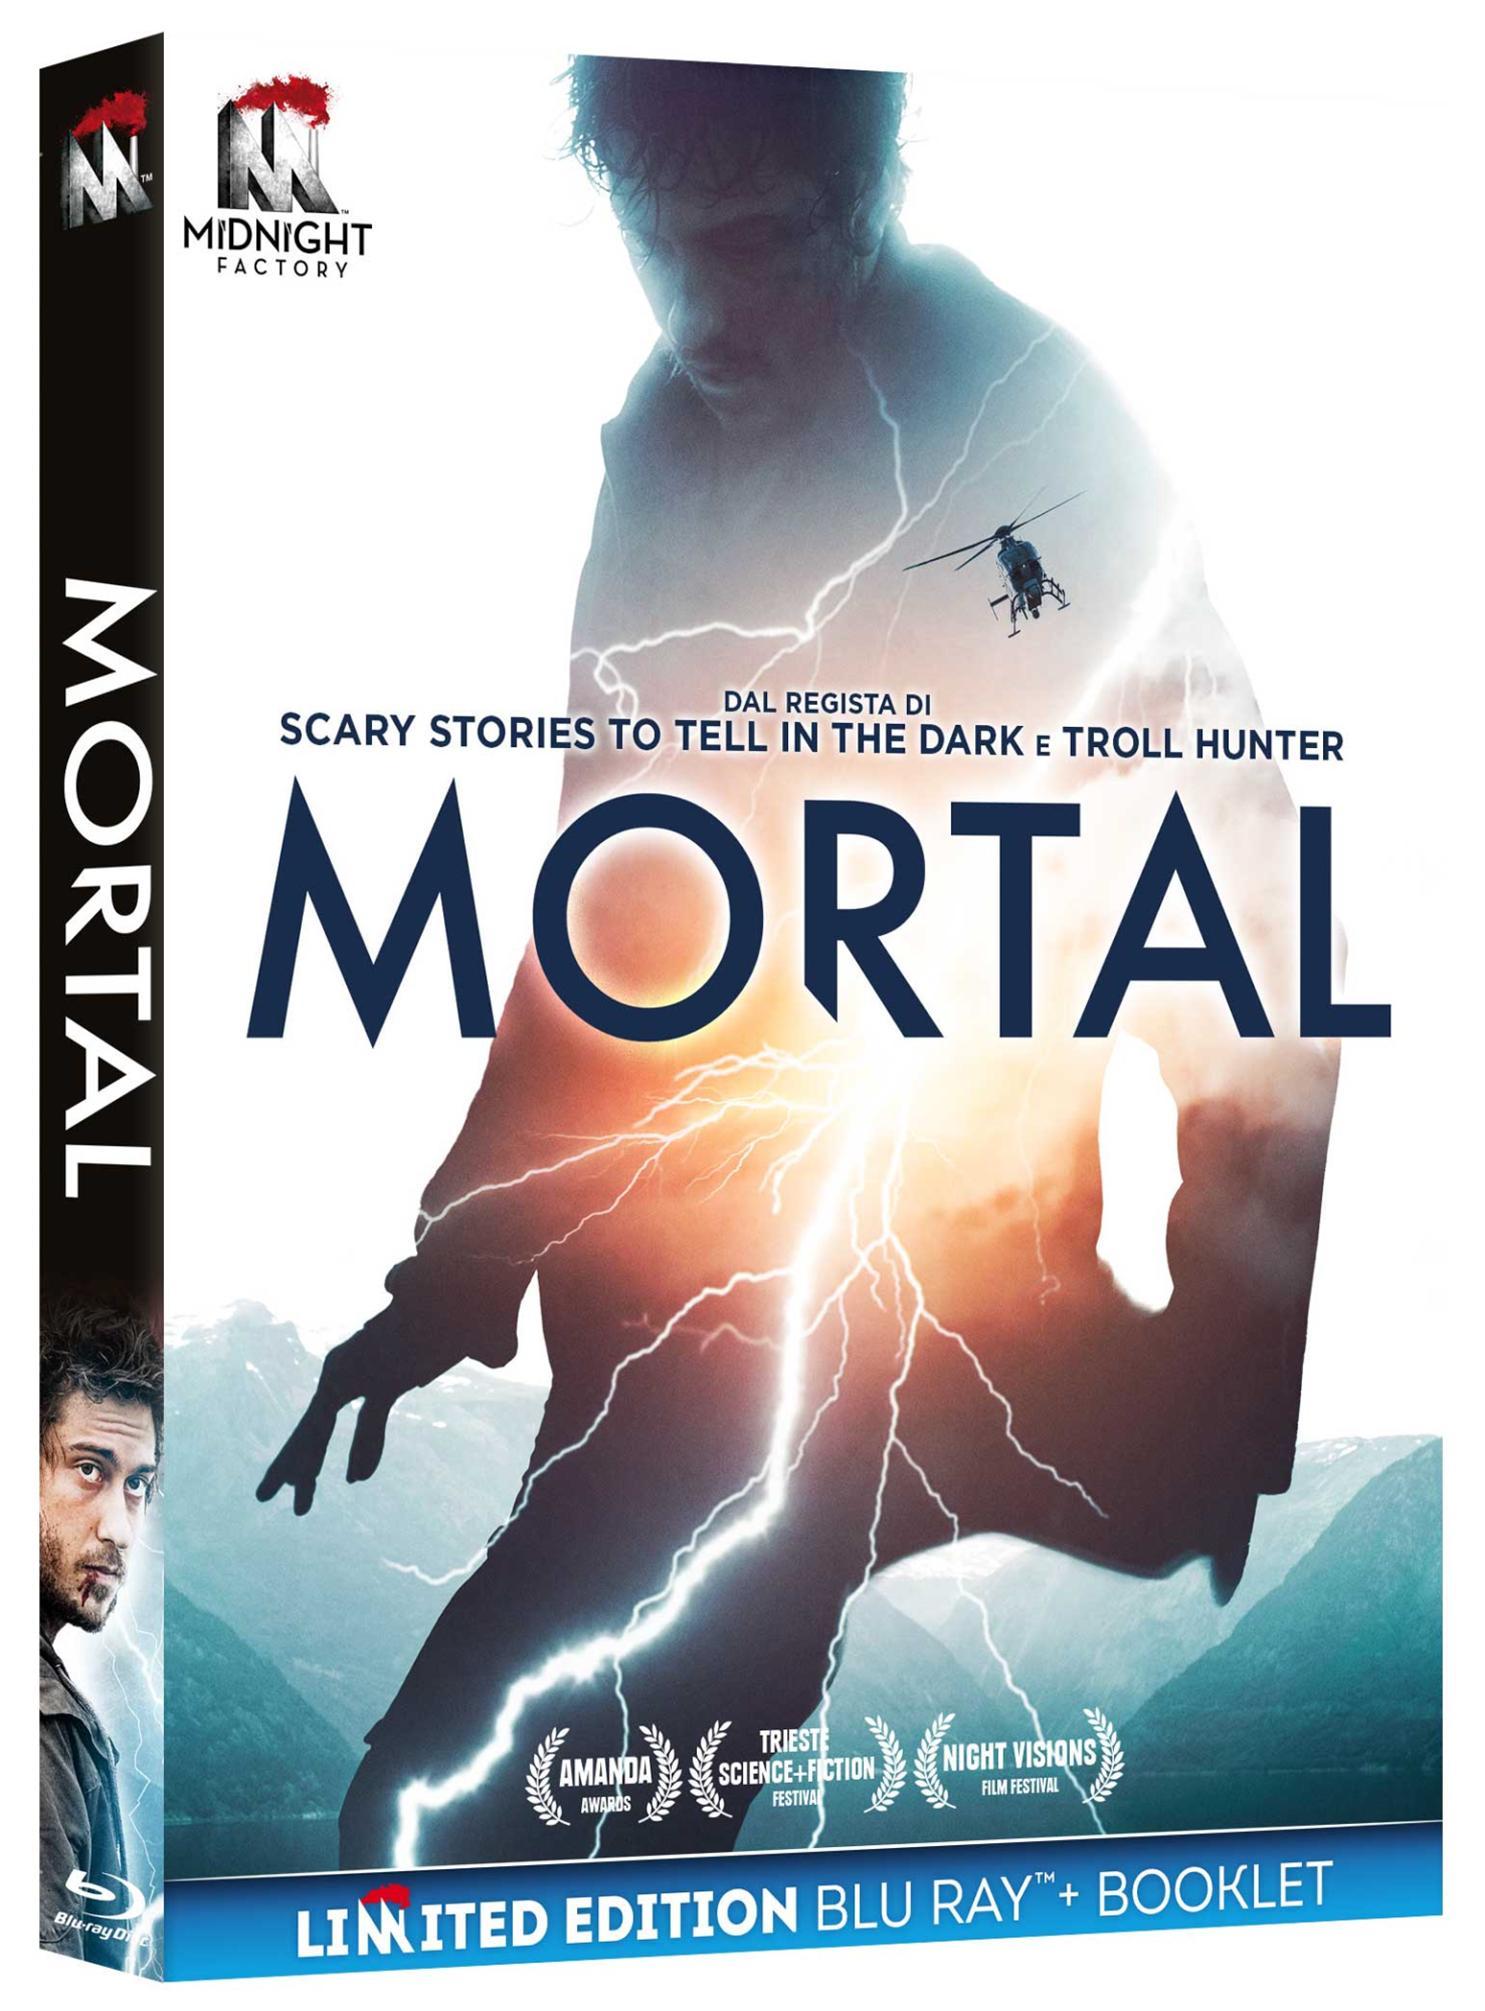 MORTAL (BLU-RAY+BOOKLET)